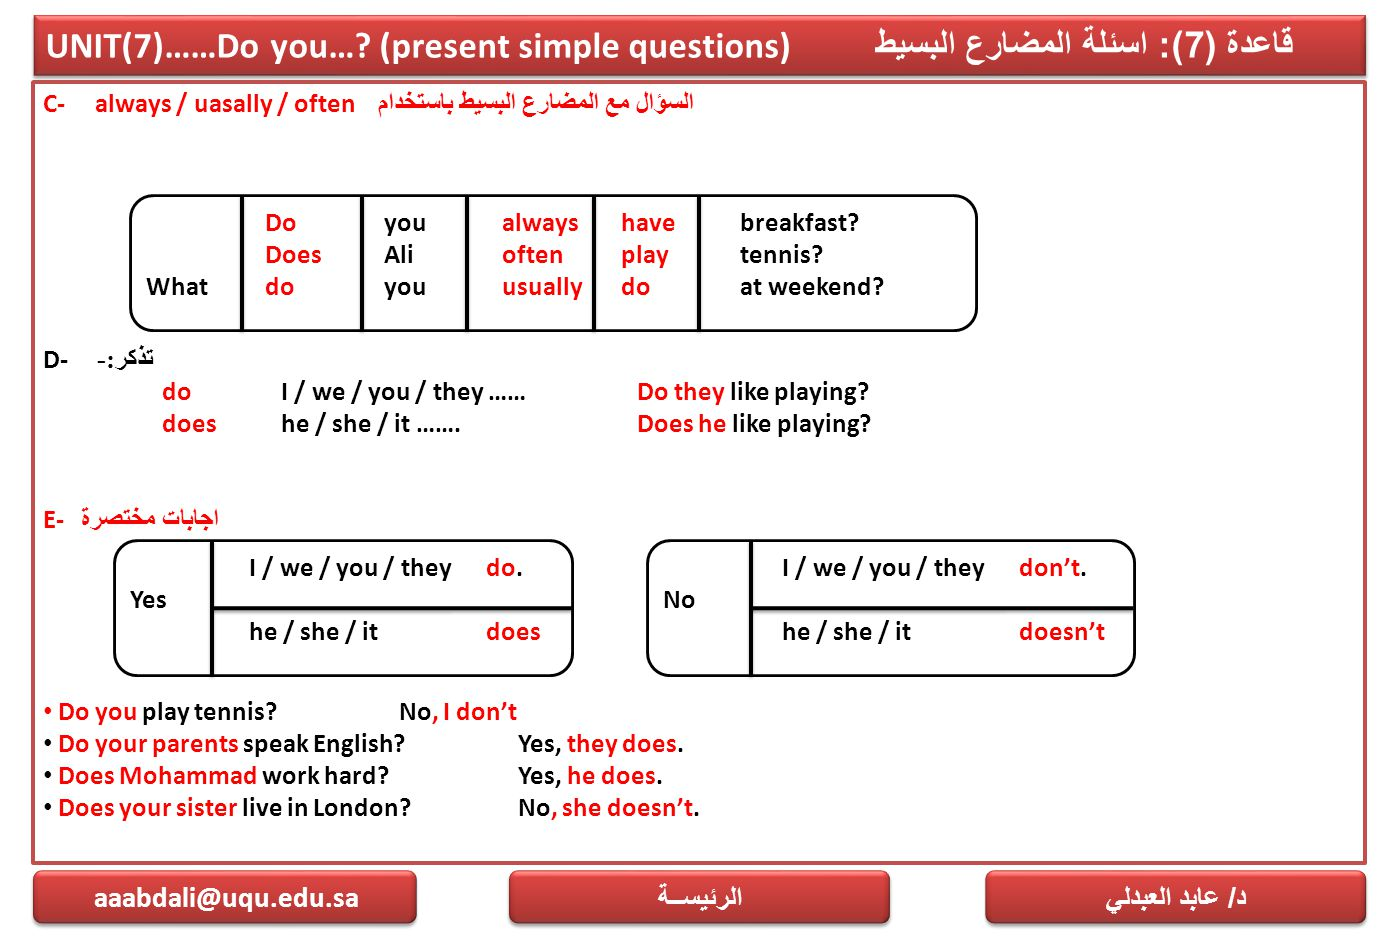 UNIT(7)……Do you…? (present simple questions) قاعدة (7): اسئلة المضارع البسيط C- always / uasally / often السؤال مع المضارع البسيط باستخدام D- تذكر :-